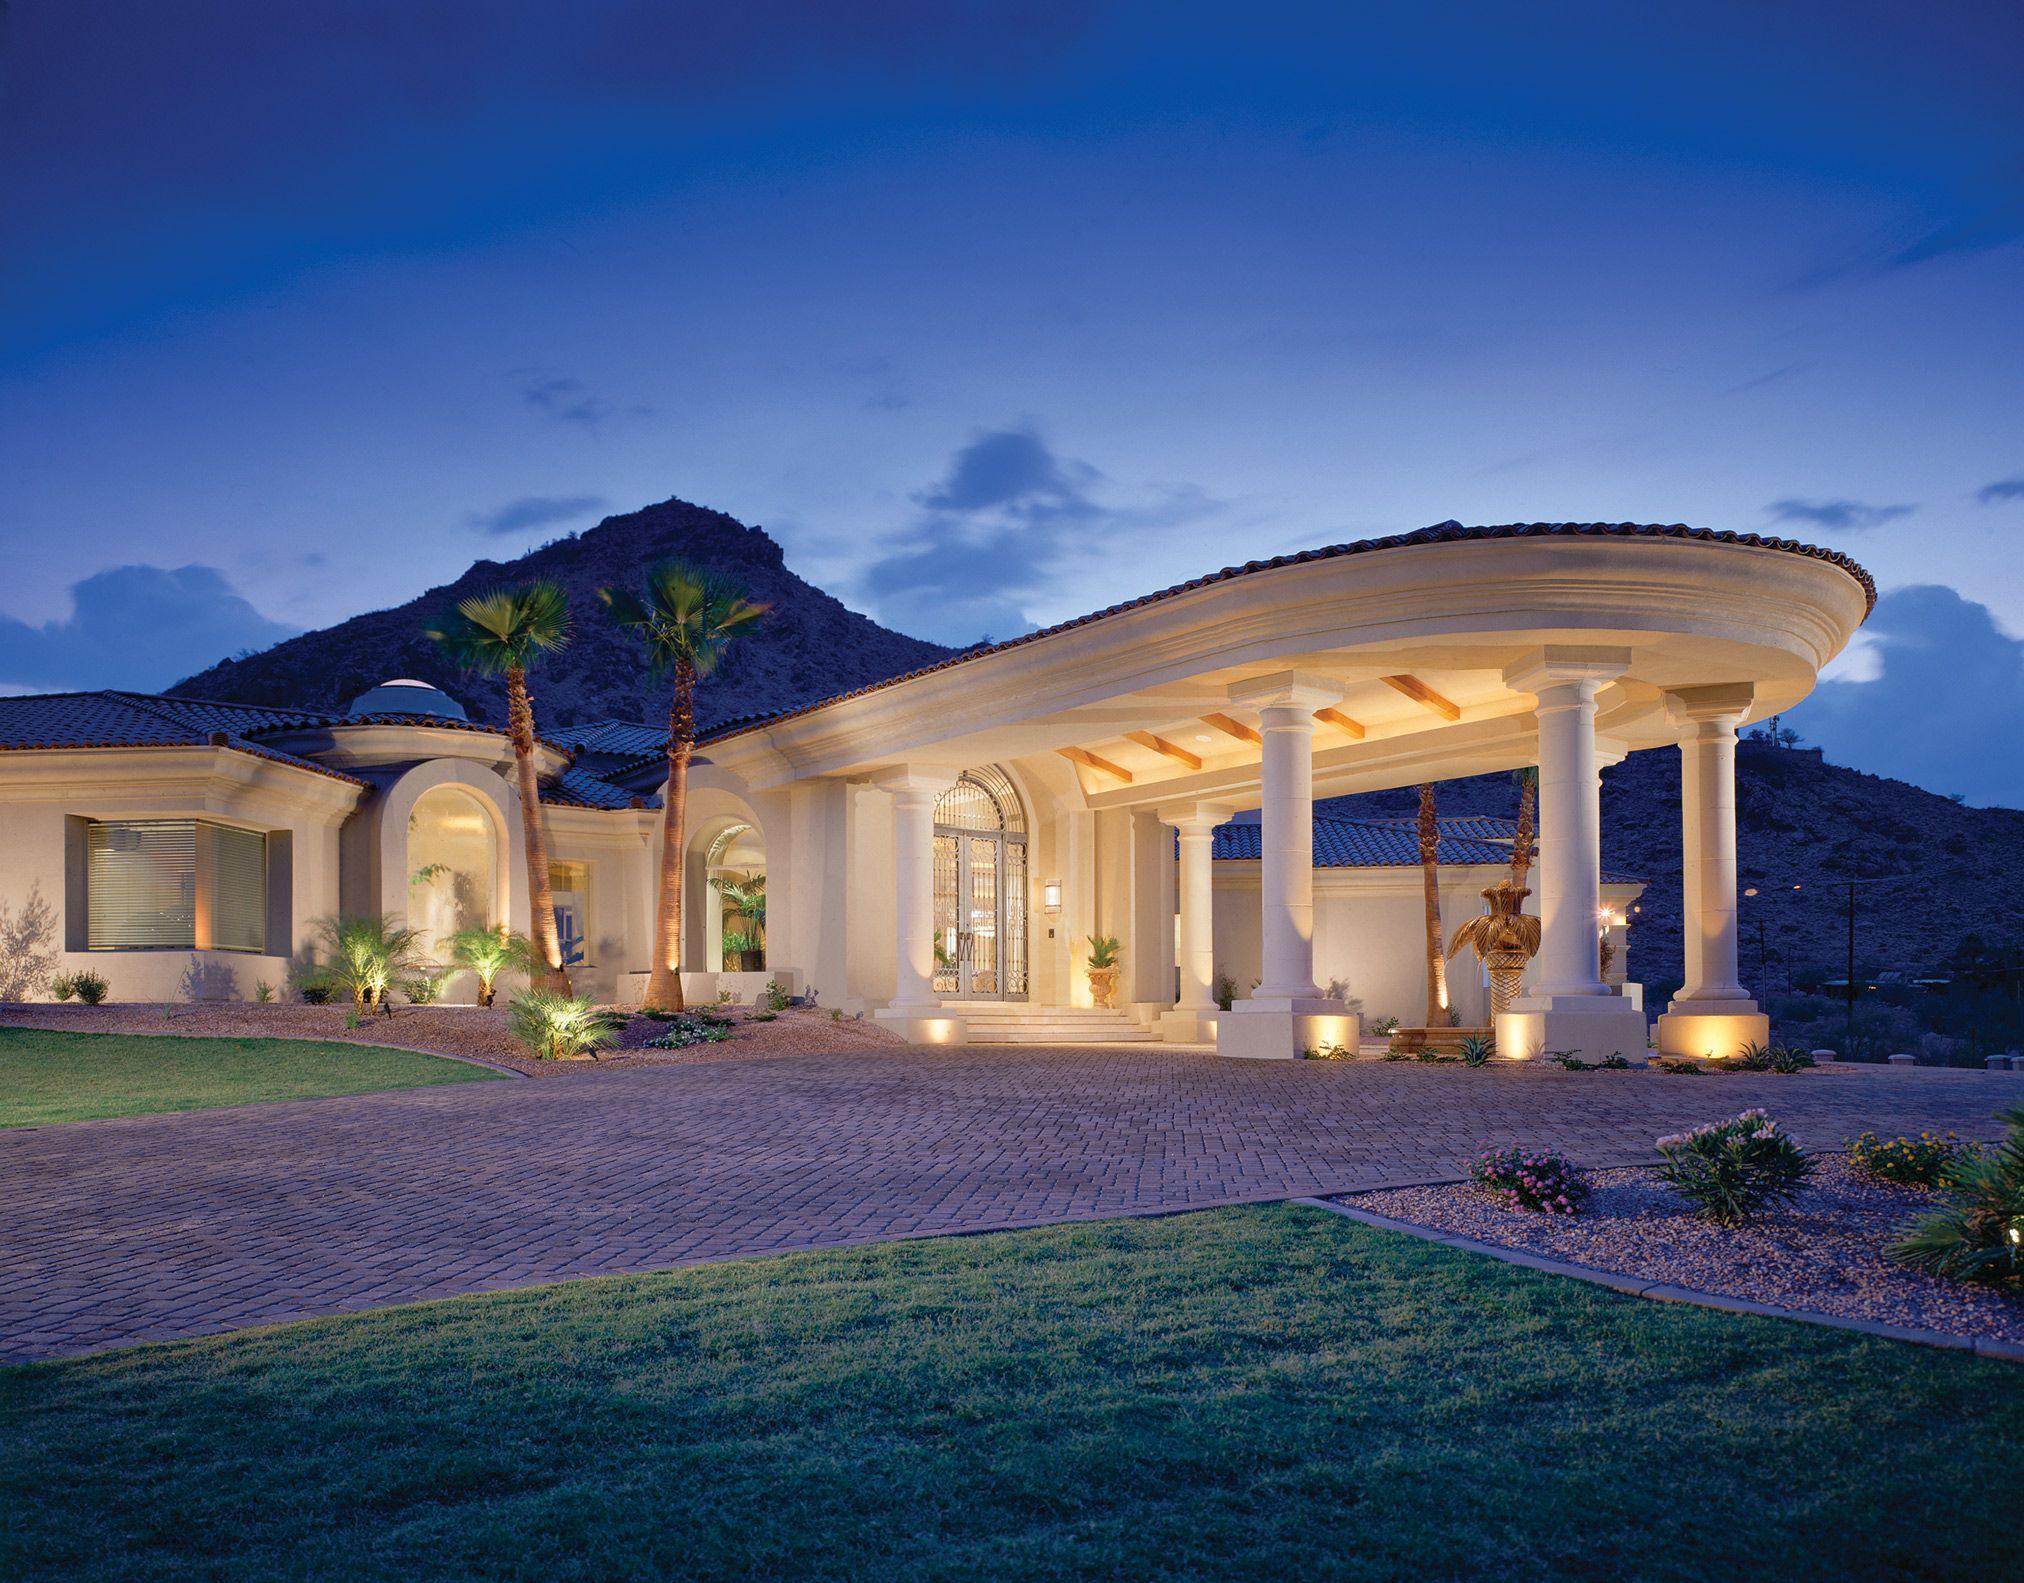 Enjoyable John B Scholz Architect Inc Desert Palace My Style Largest Home Design Picture Inspirations Pitcheantrous